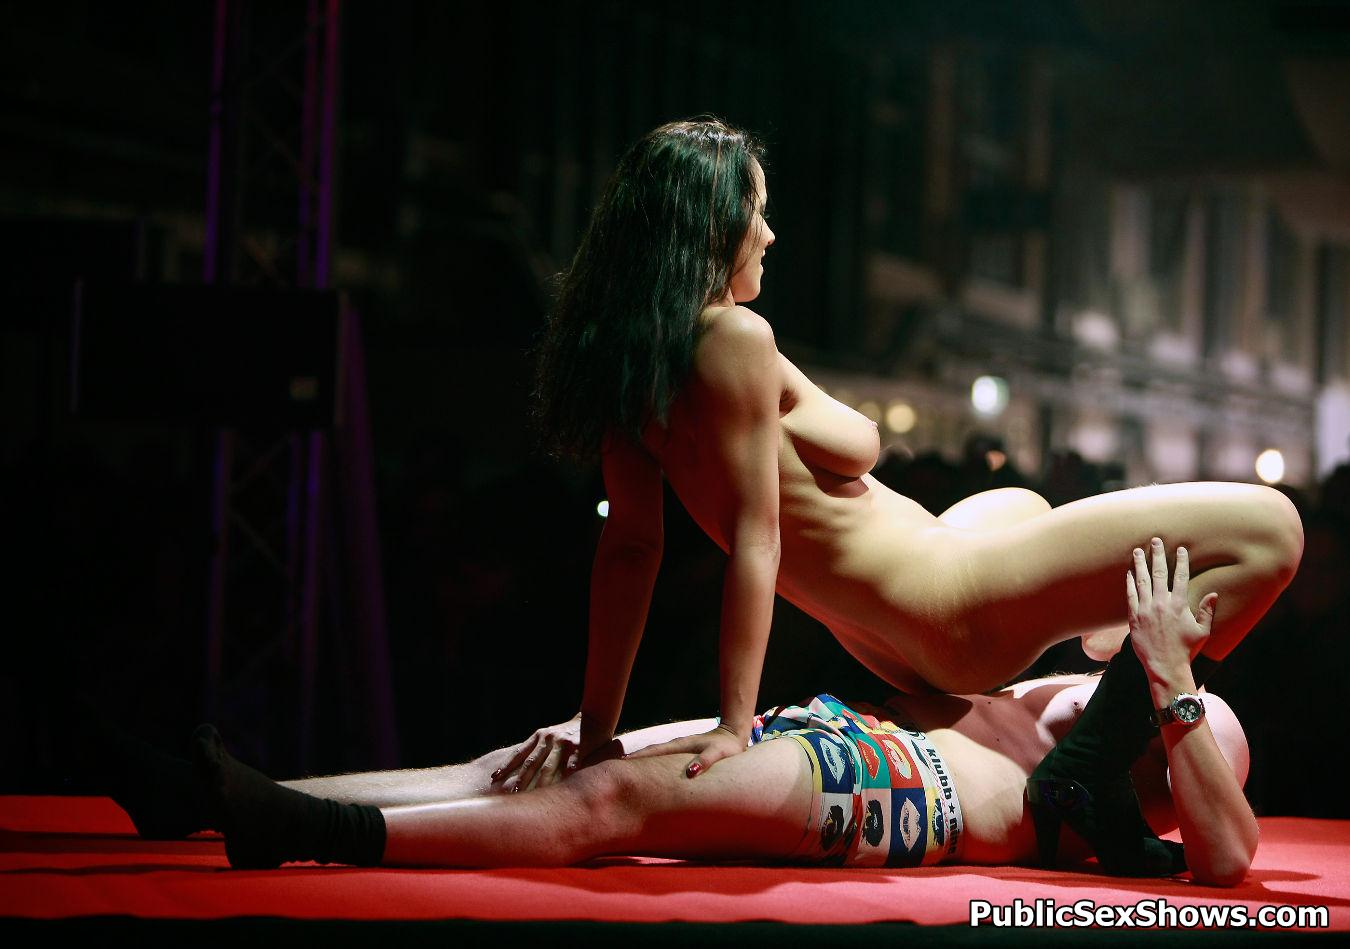 female stripping the men